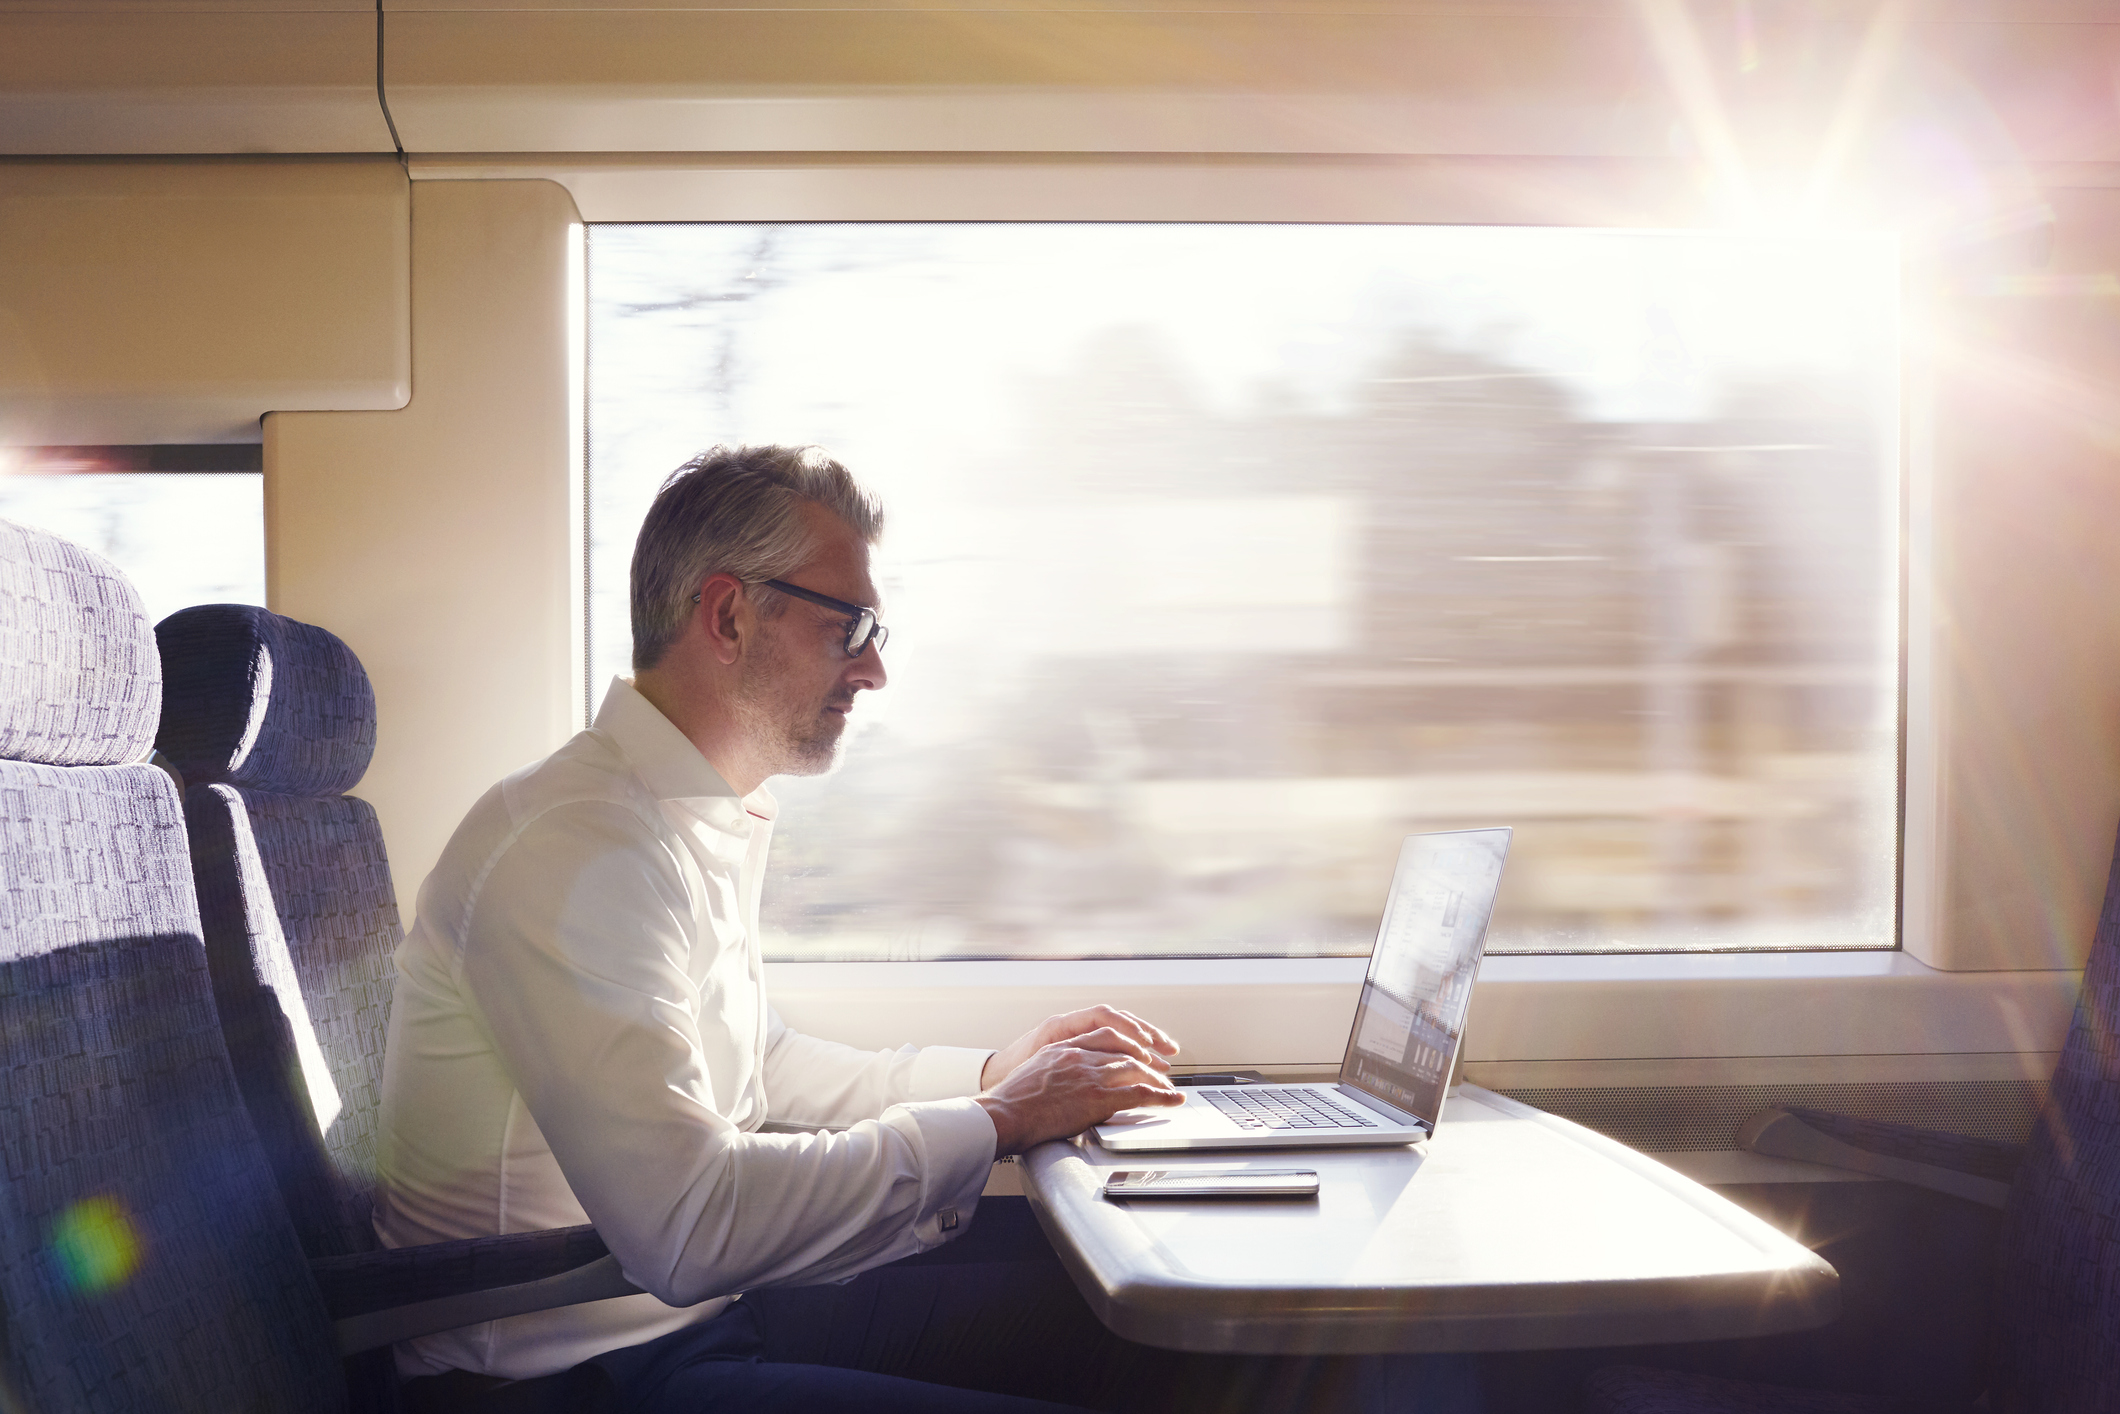 Businessman working on a commuter train.